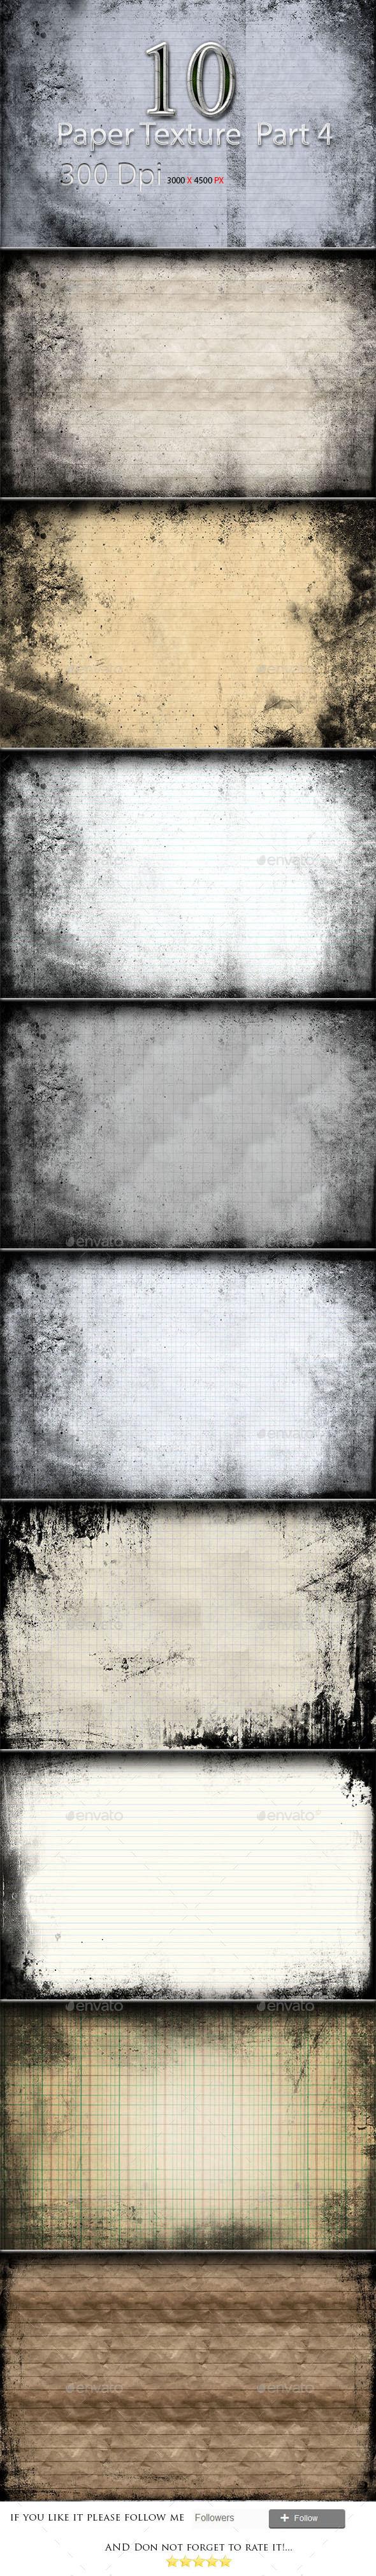 10 Paper Texture Part 4 - Textures